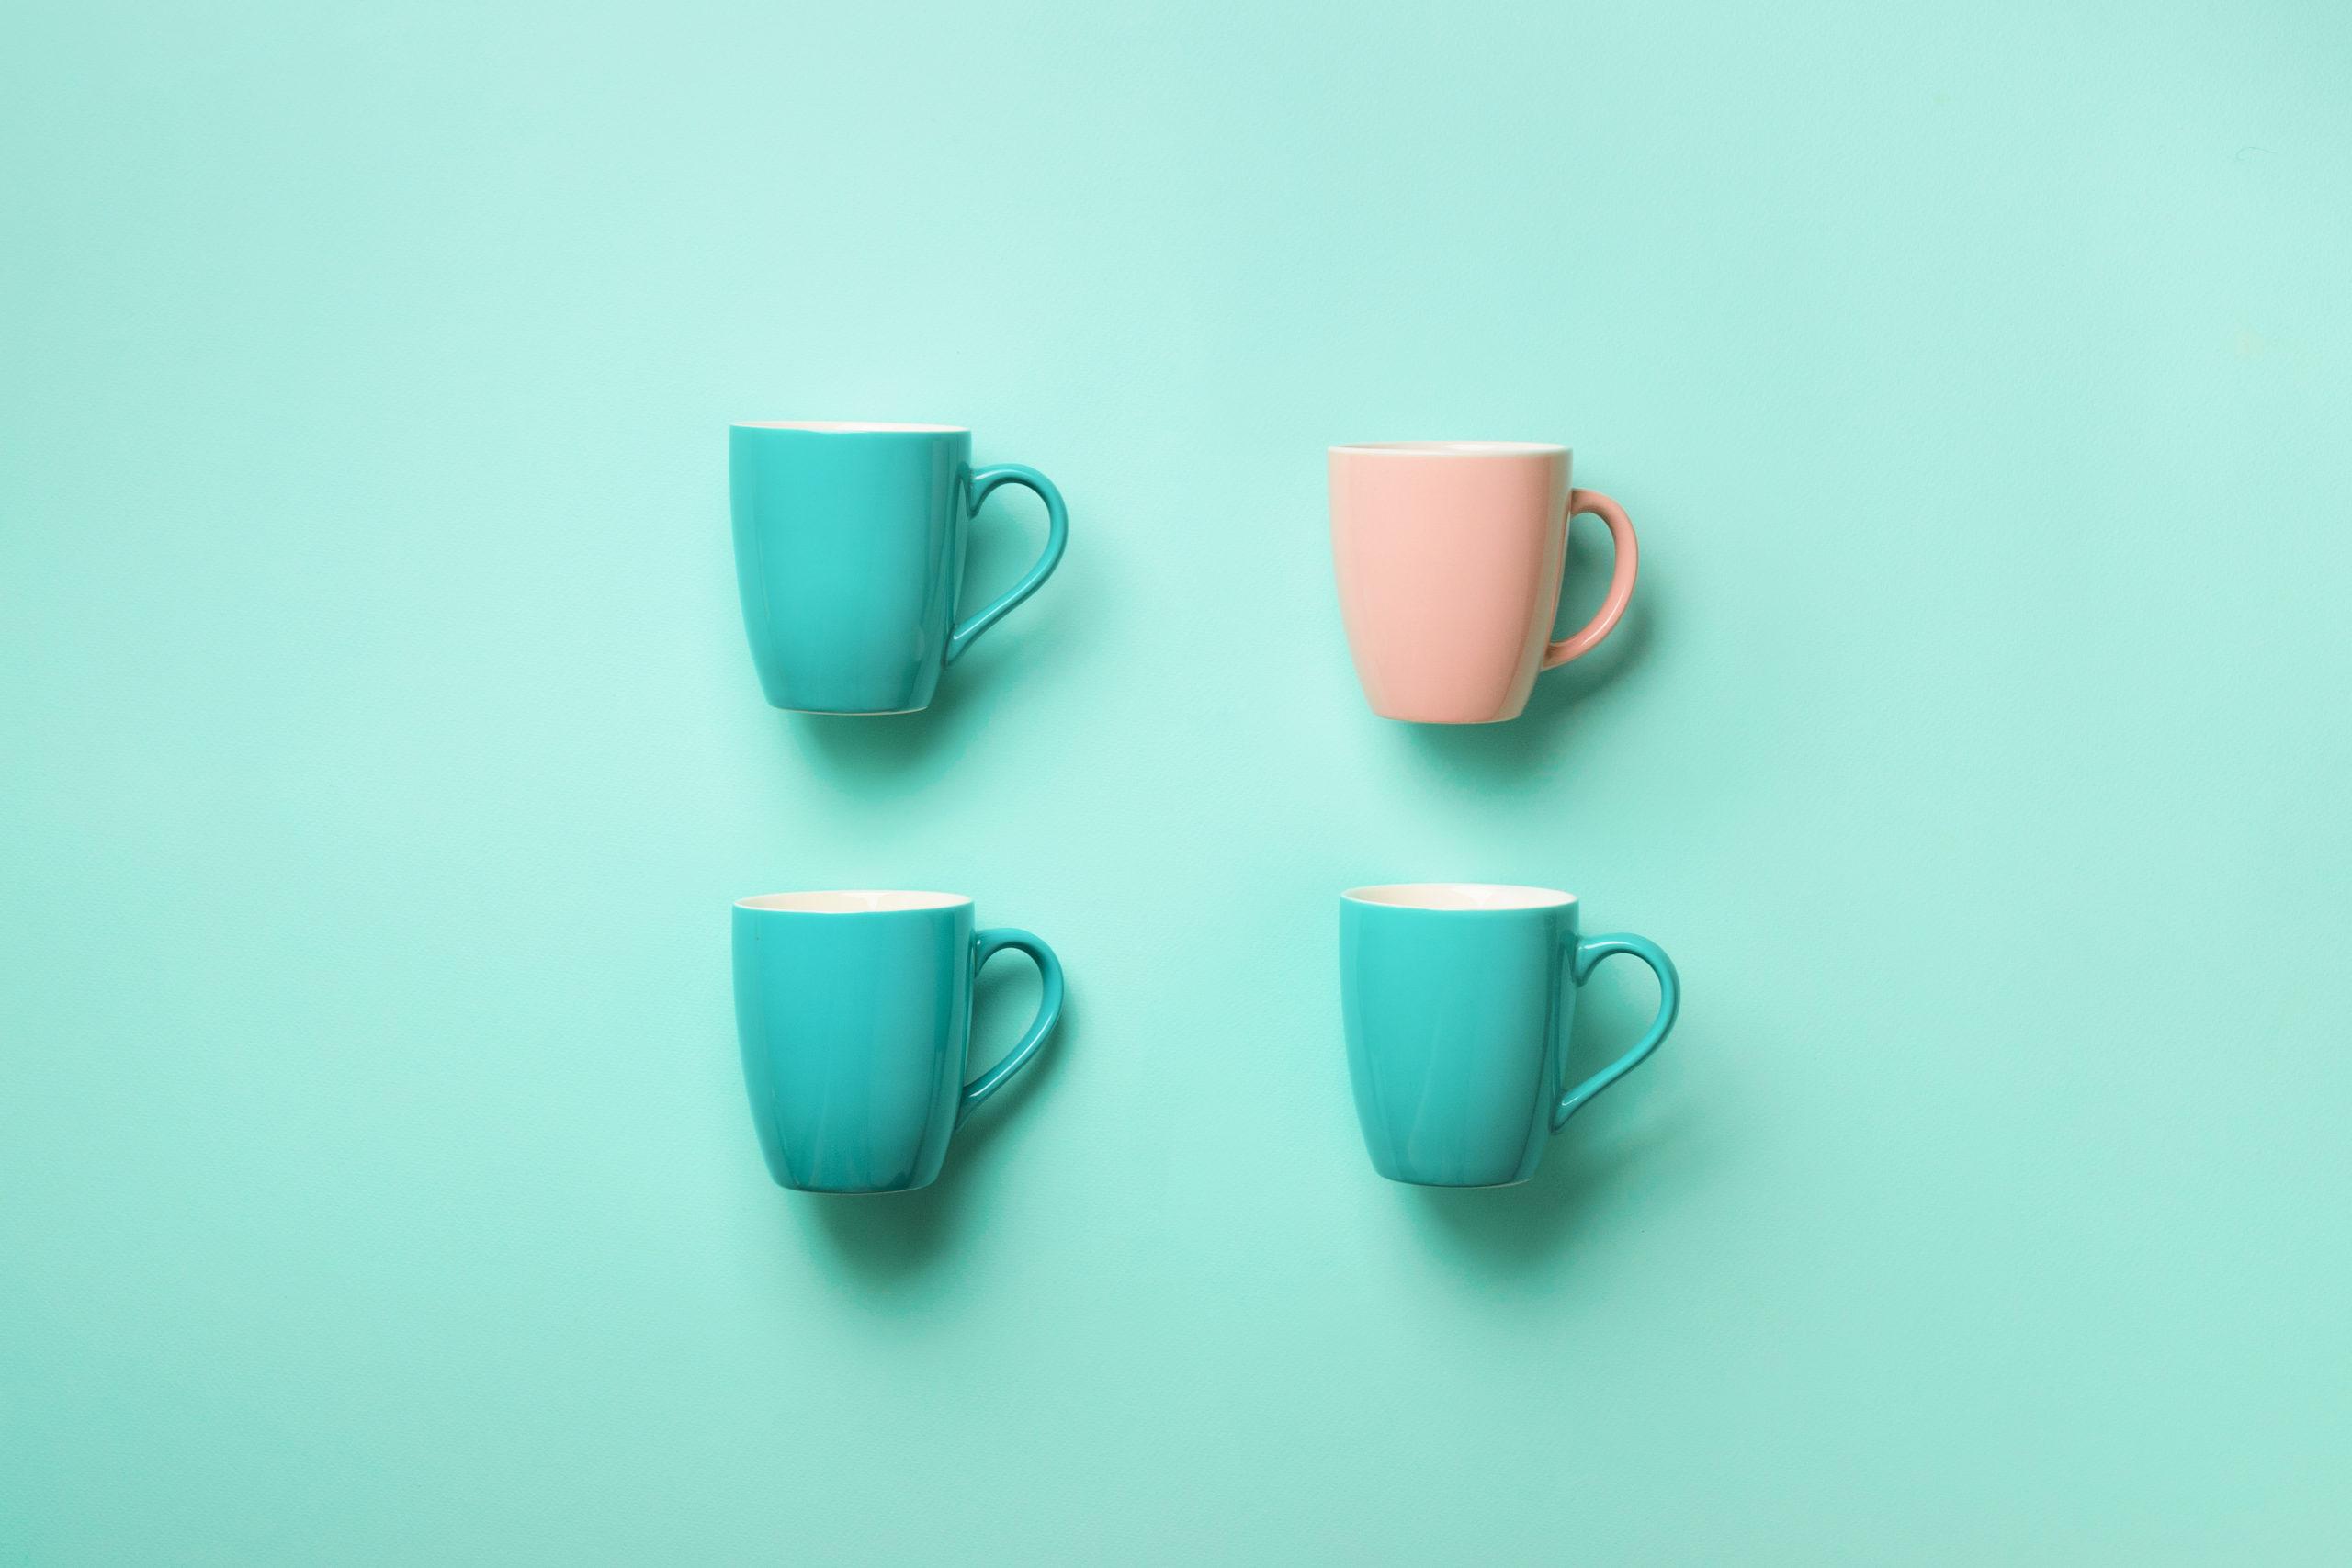 tazas-cafe-fondo-turquesa